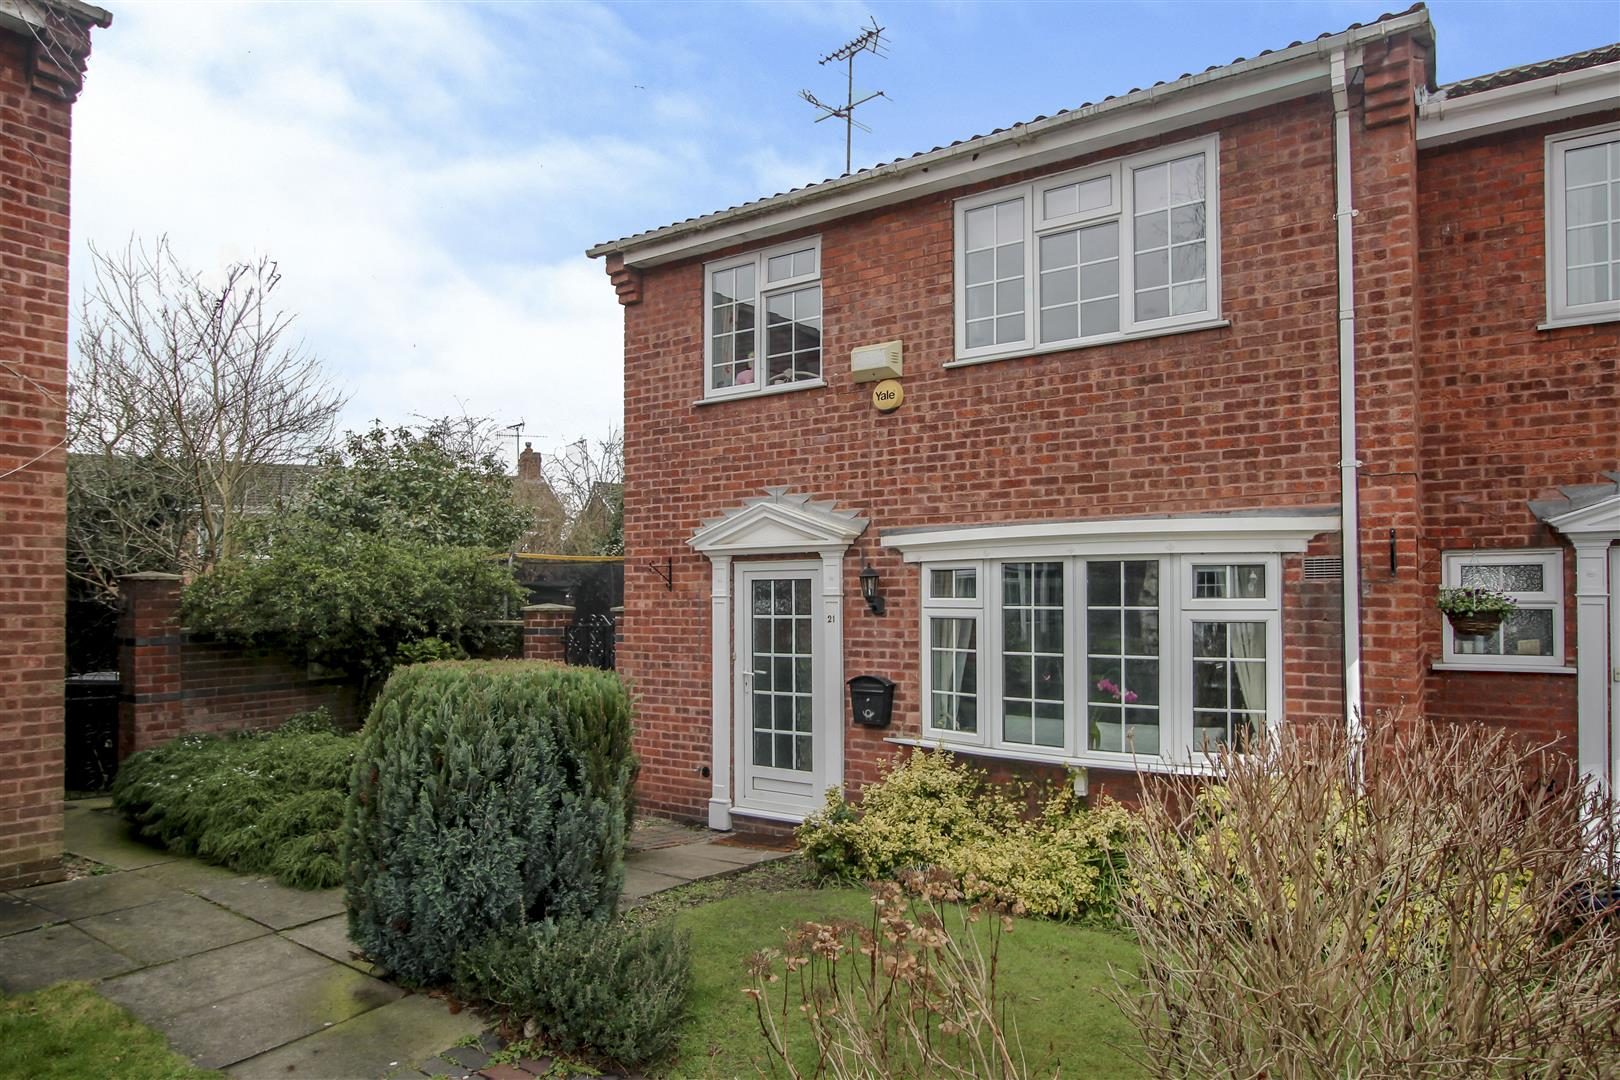 3 Bedrooms House for sale in Bembridge Court, Bramcote, Nottingham